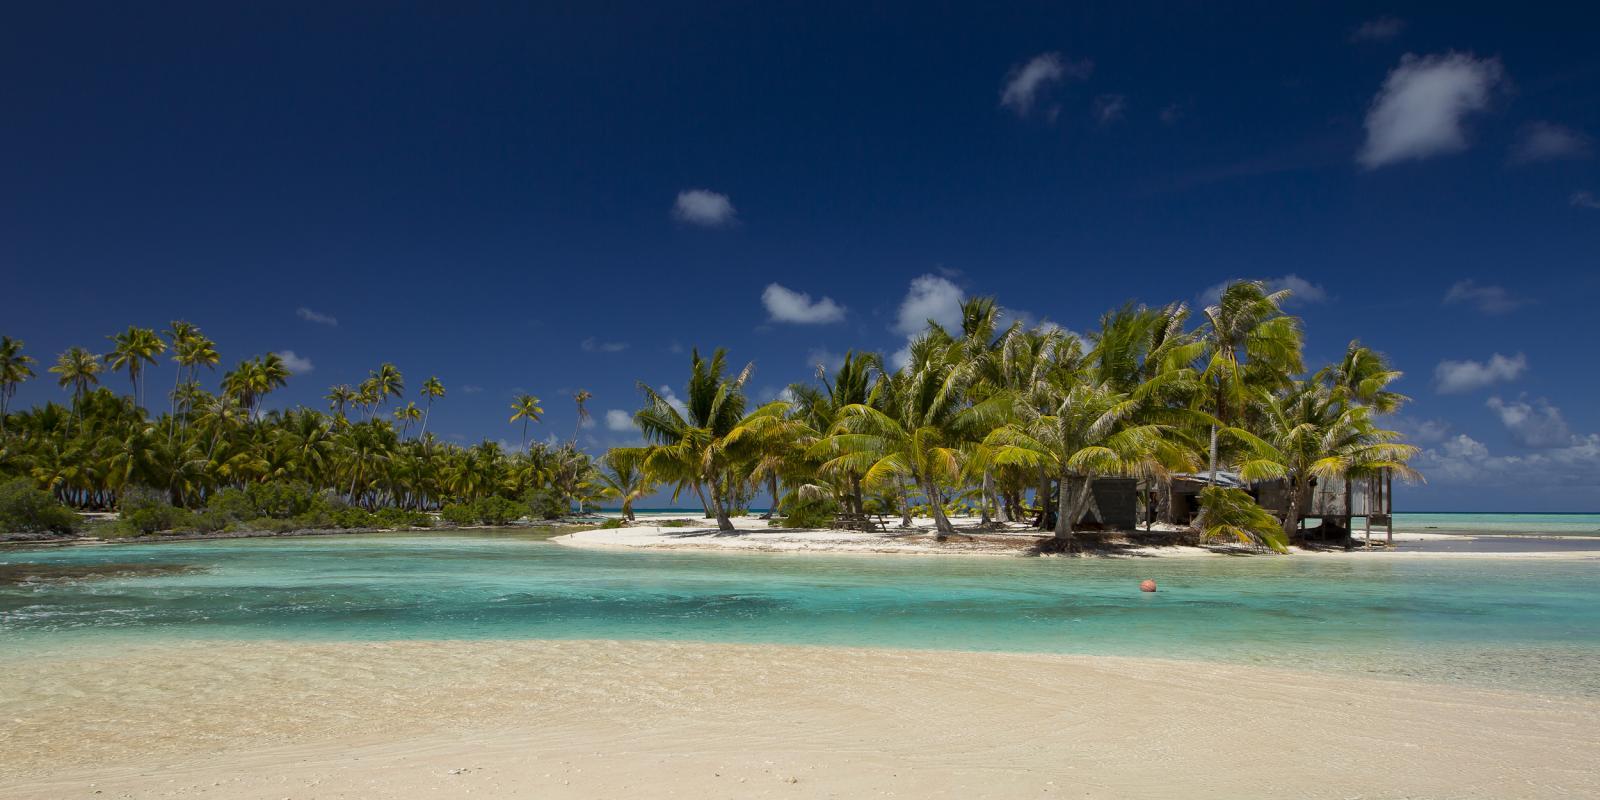 How To Get To Tuamotu Islands